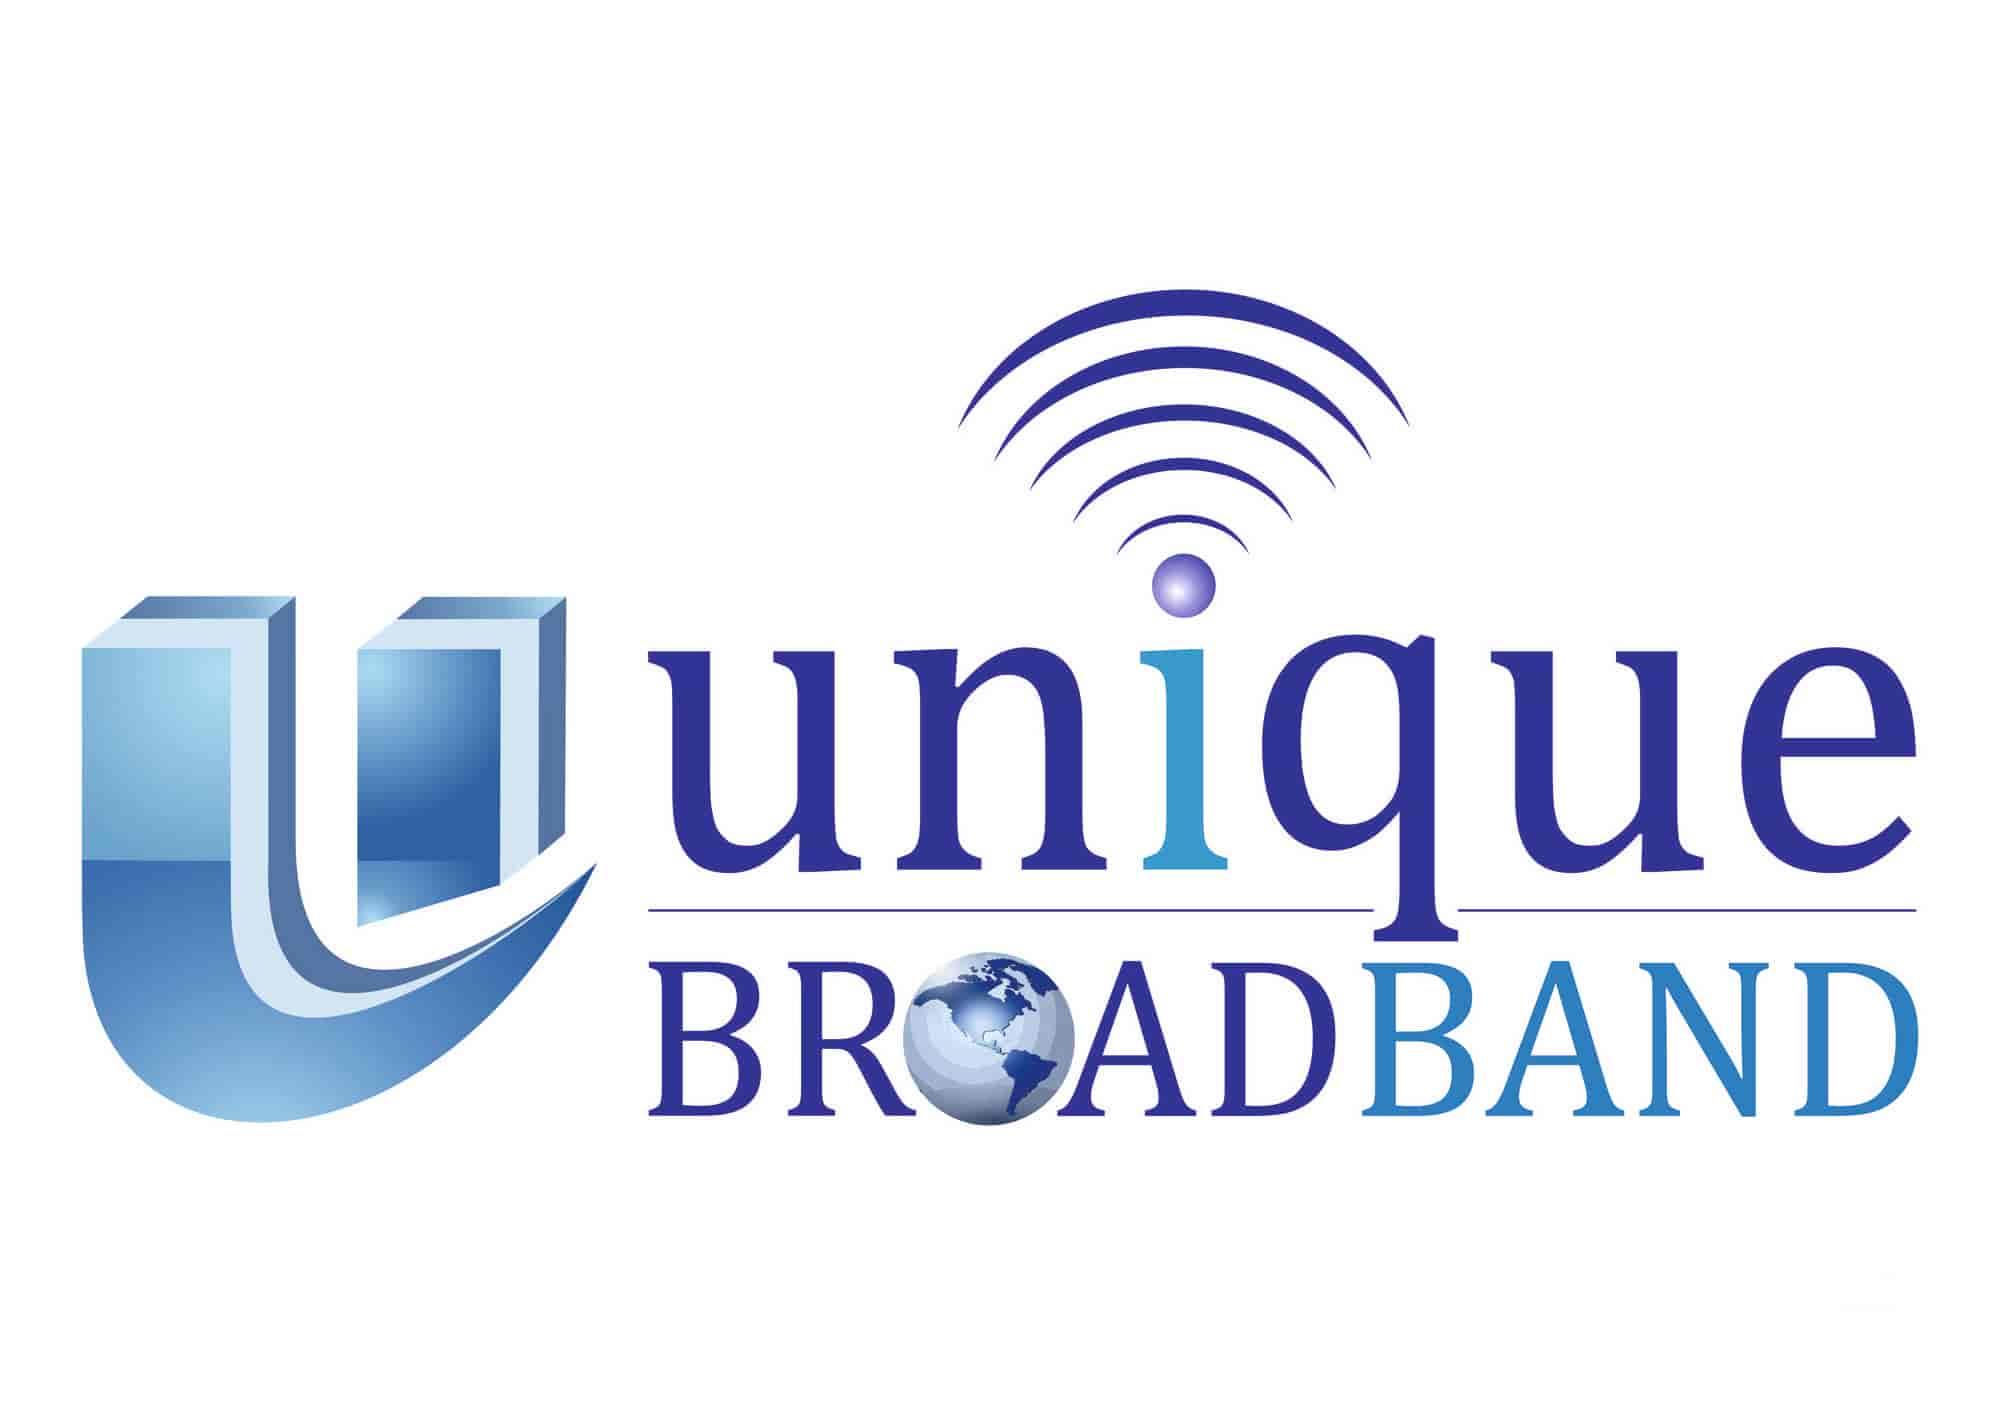 unique broadband internet service providers in junagadh justdial